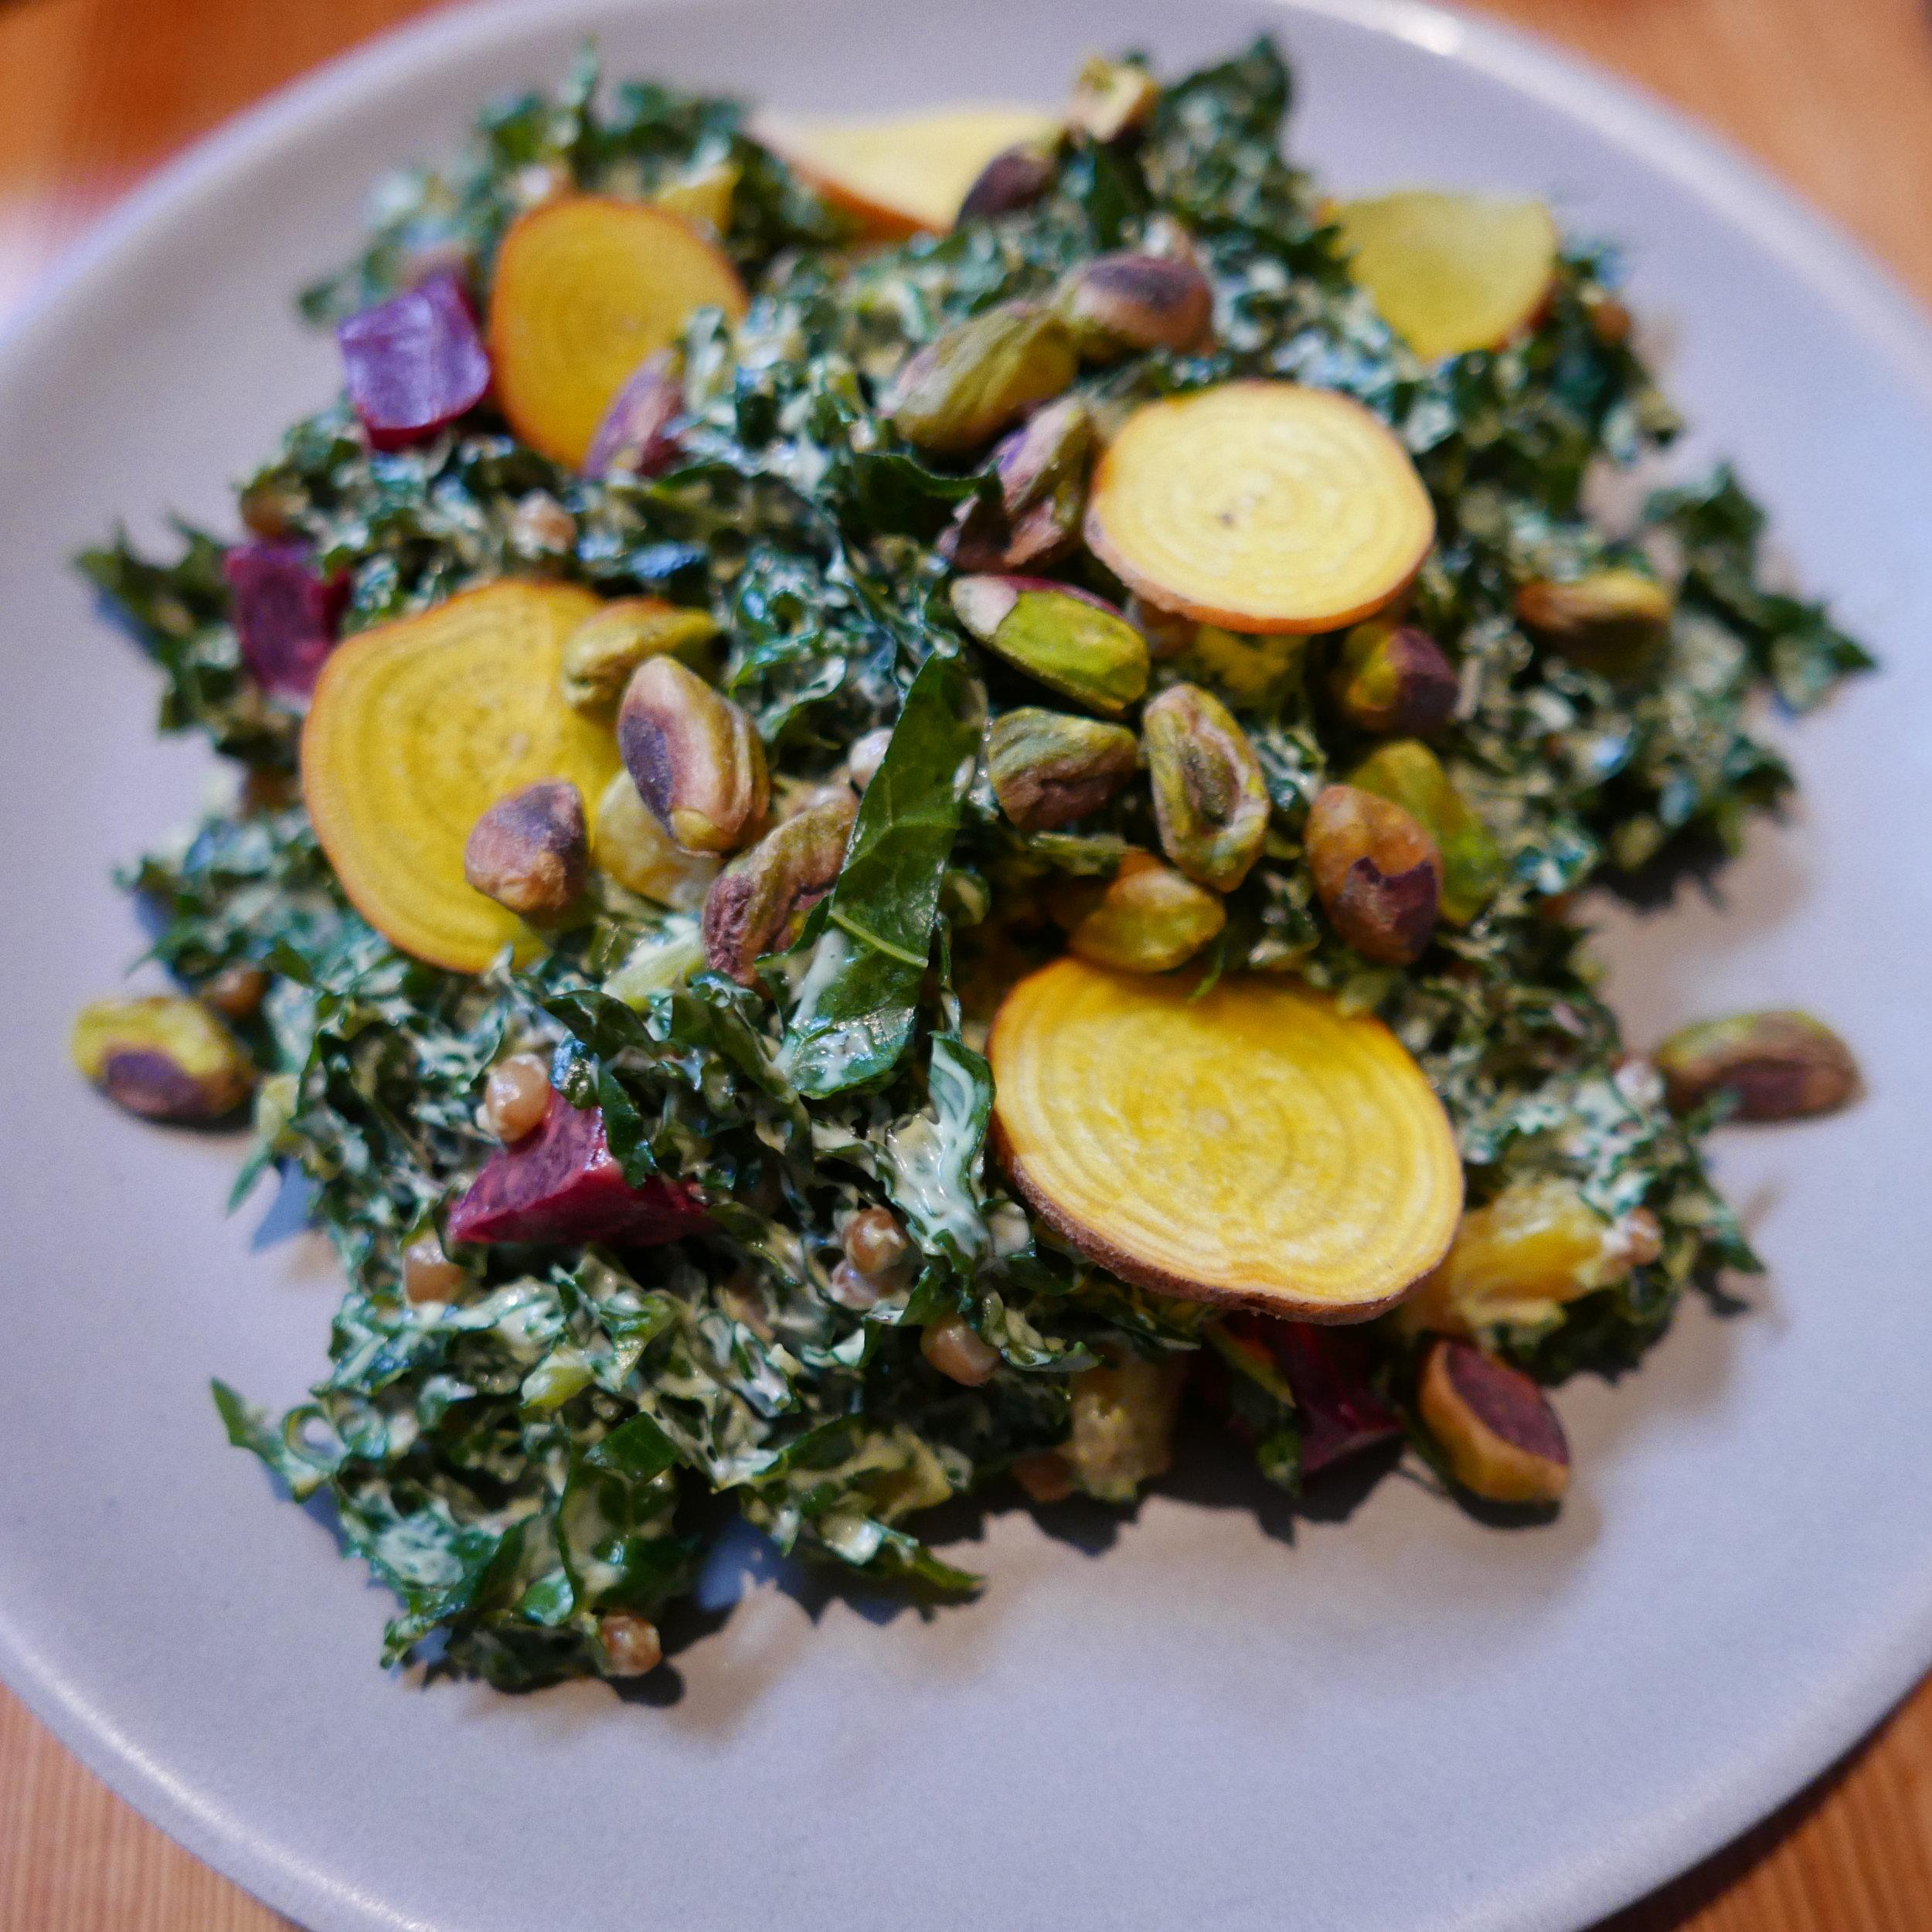 Vegan brunch - Kale salad, roasted beets, pistachios